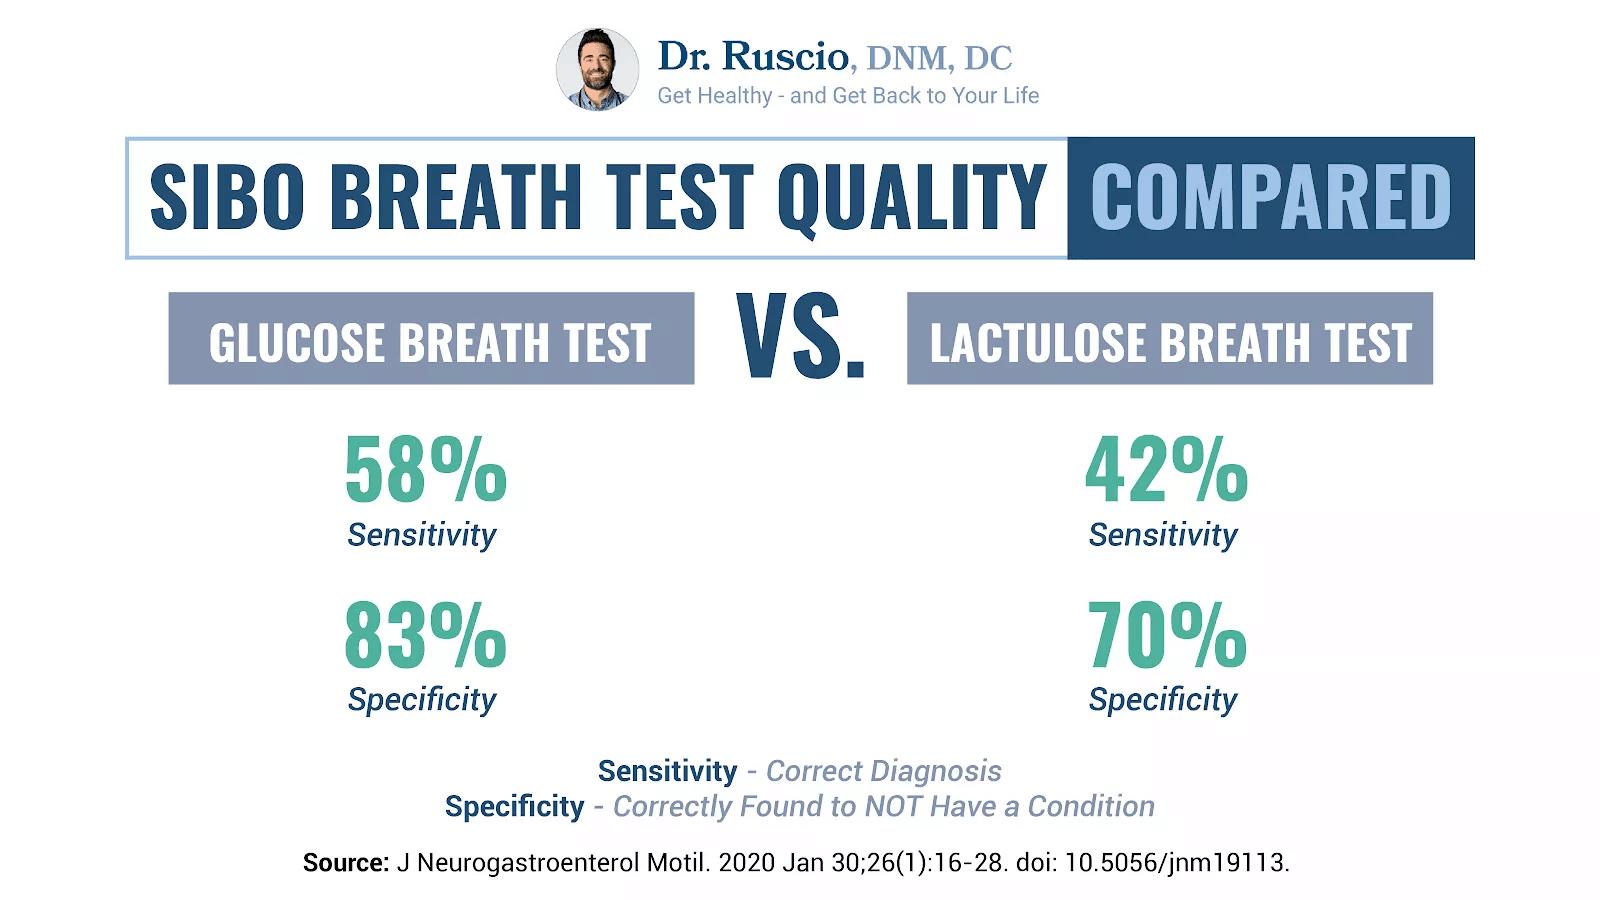 SIBO breath test quality comparison chart by Dr. Ruscio